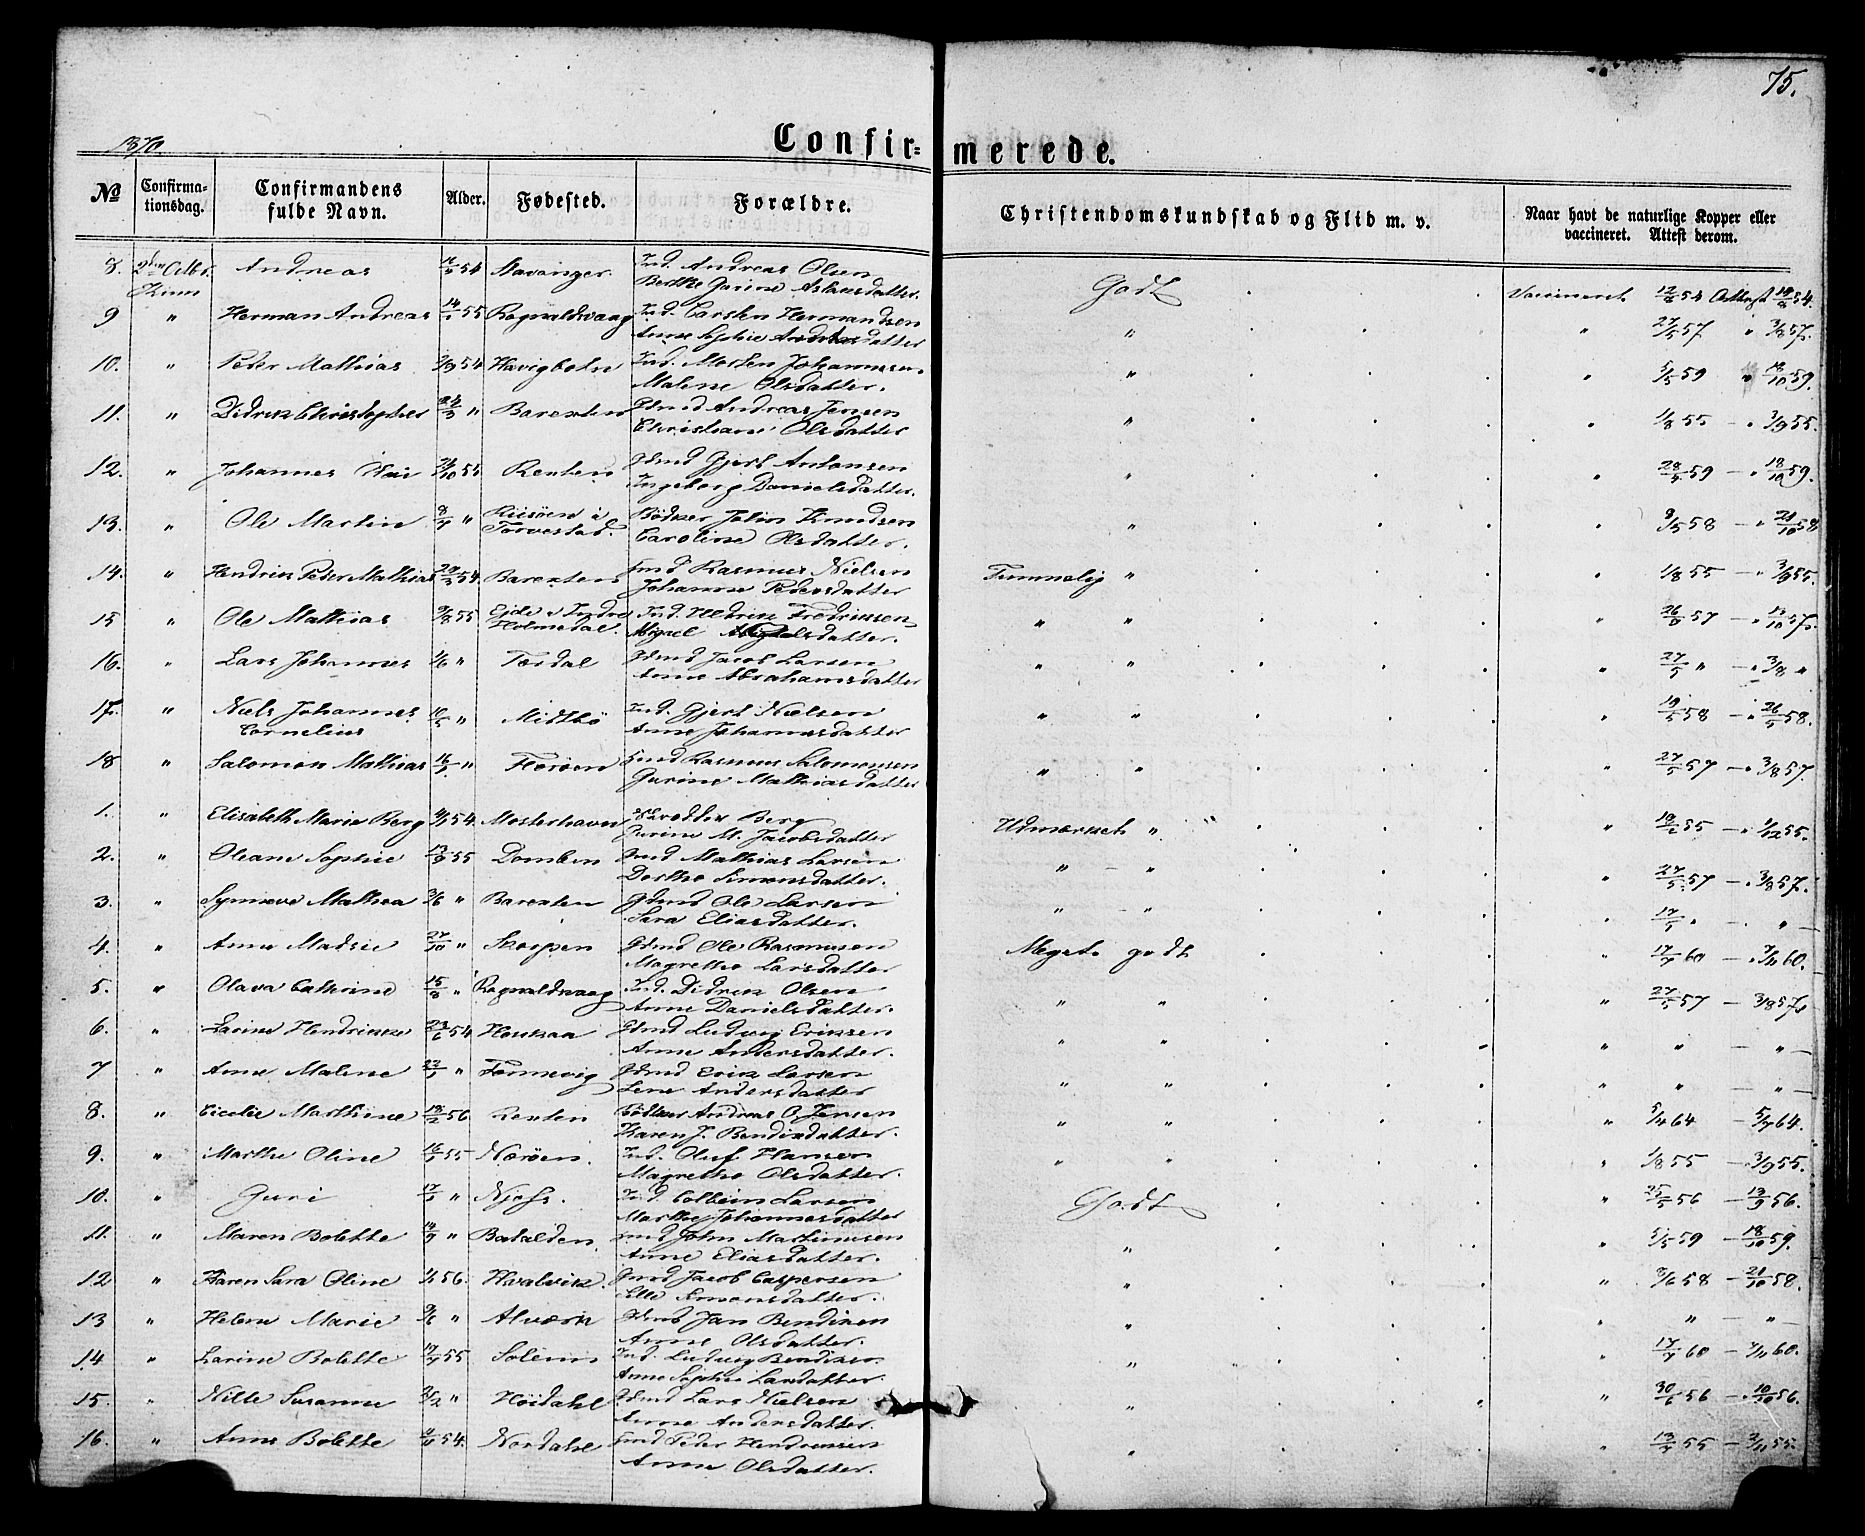 SAB, Kinn sokneprestembete, H/Haa/Haaa/L0008: Ministerialbok nr. A 8, 1859-1882, s. 75